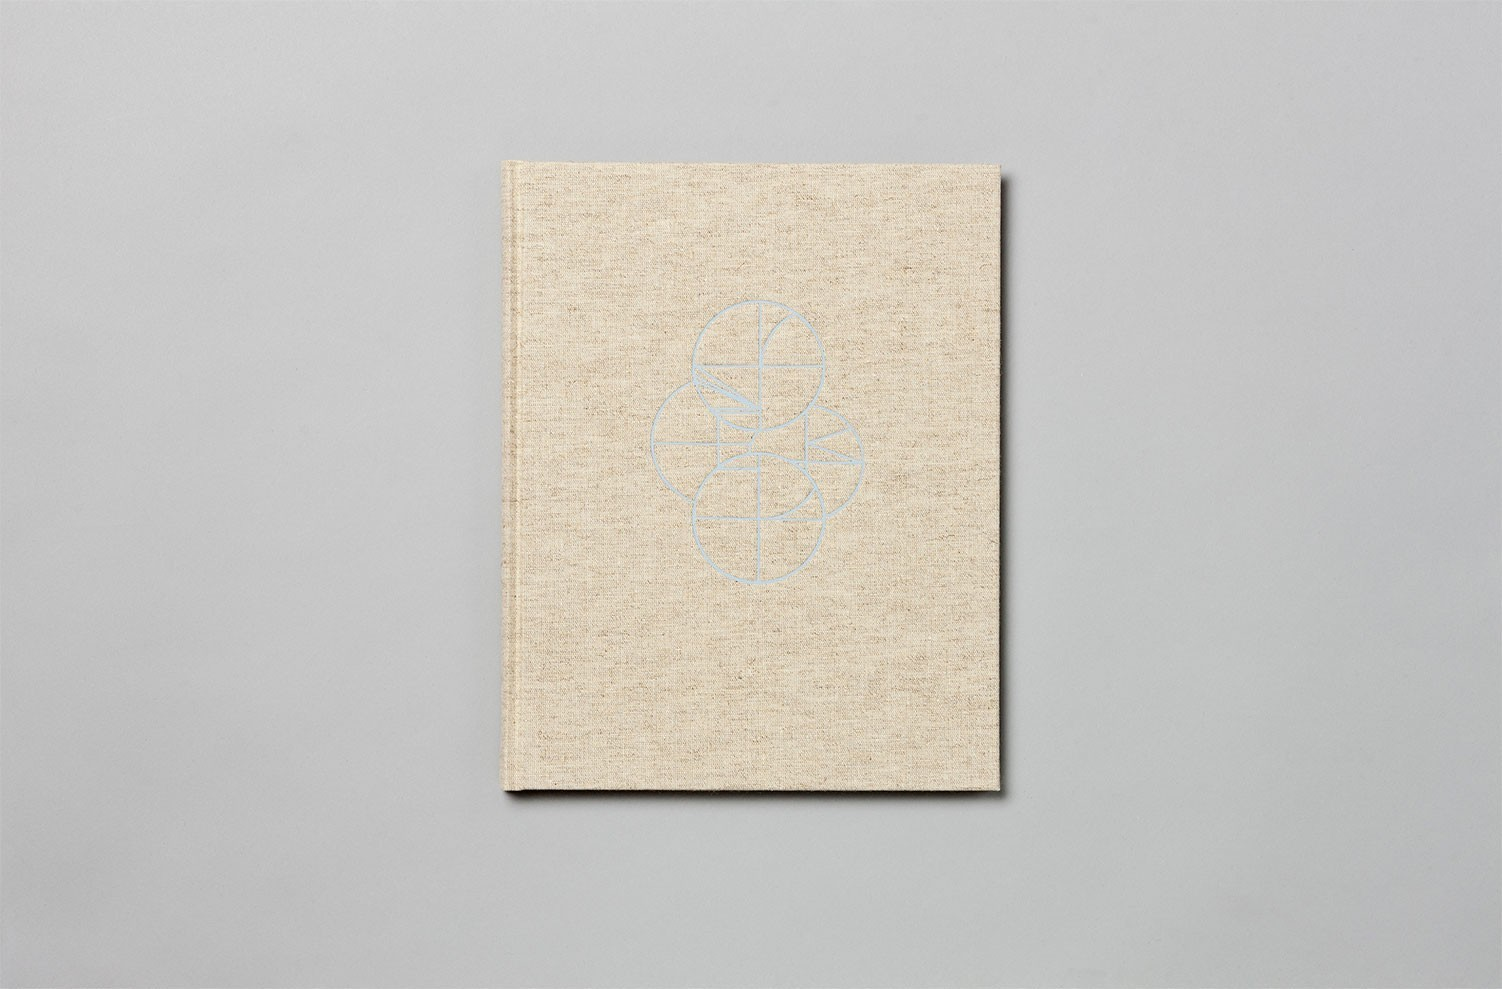 ritator_hans_andersson_artist_book_1